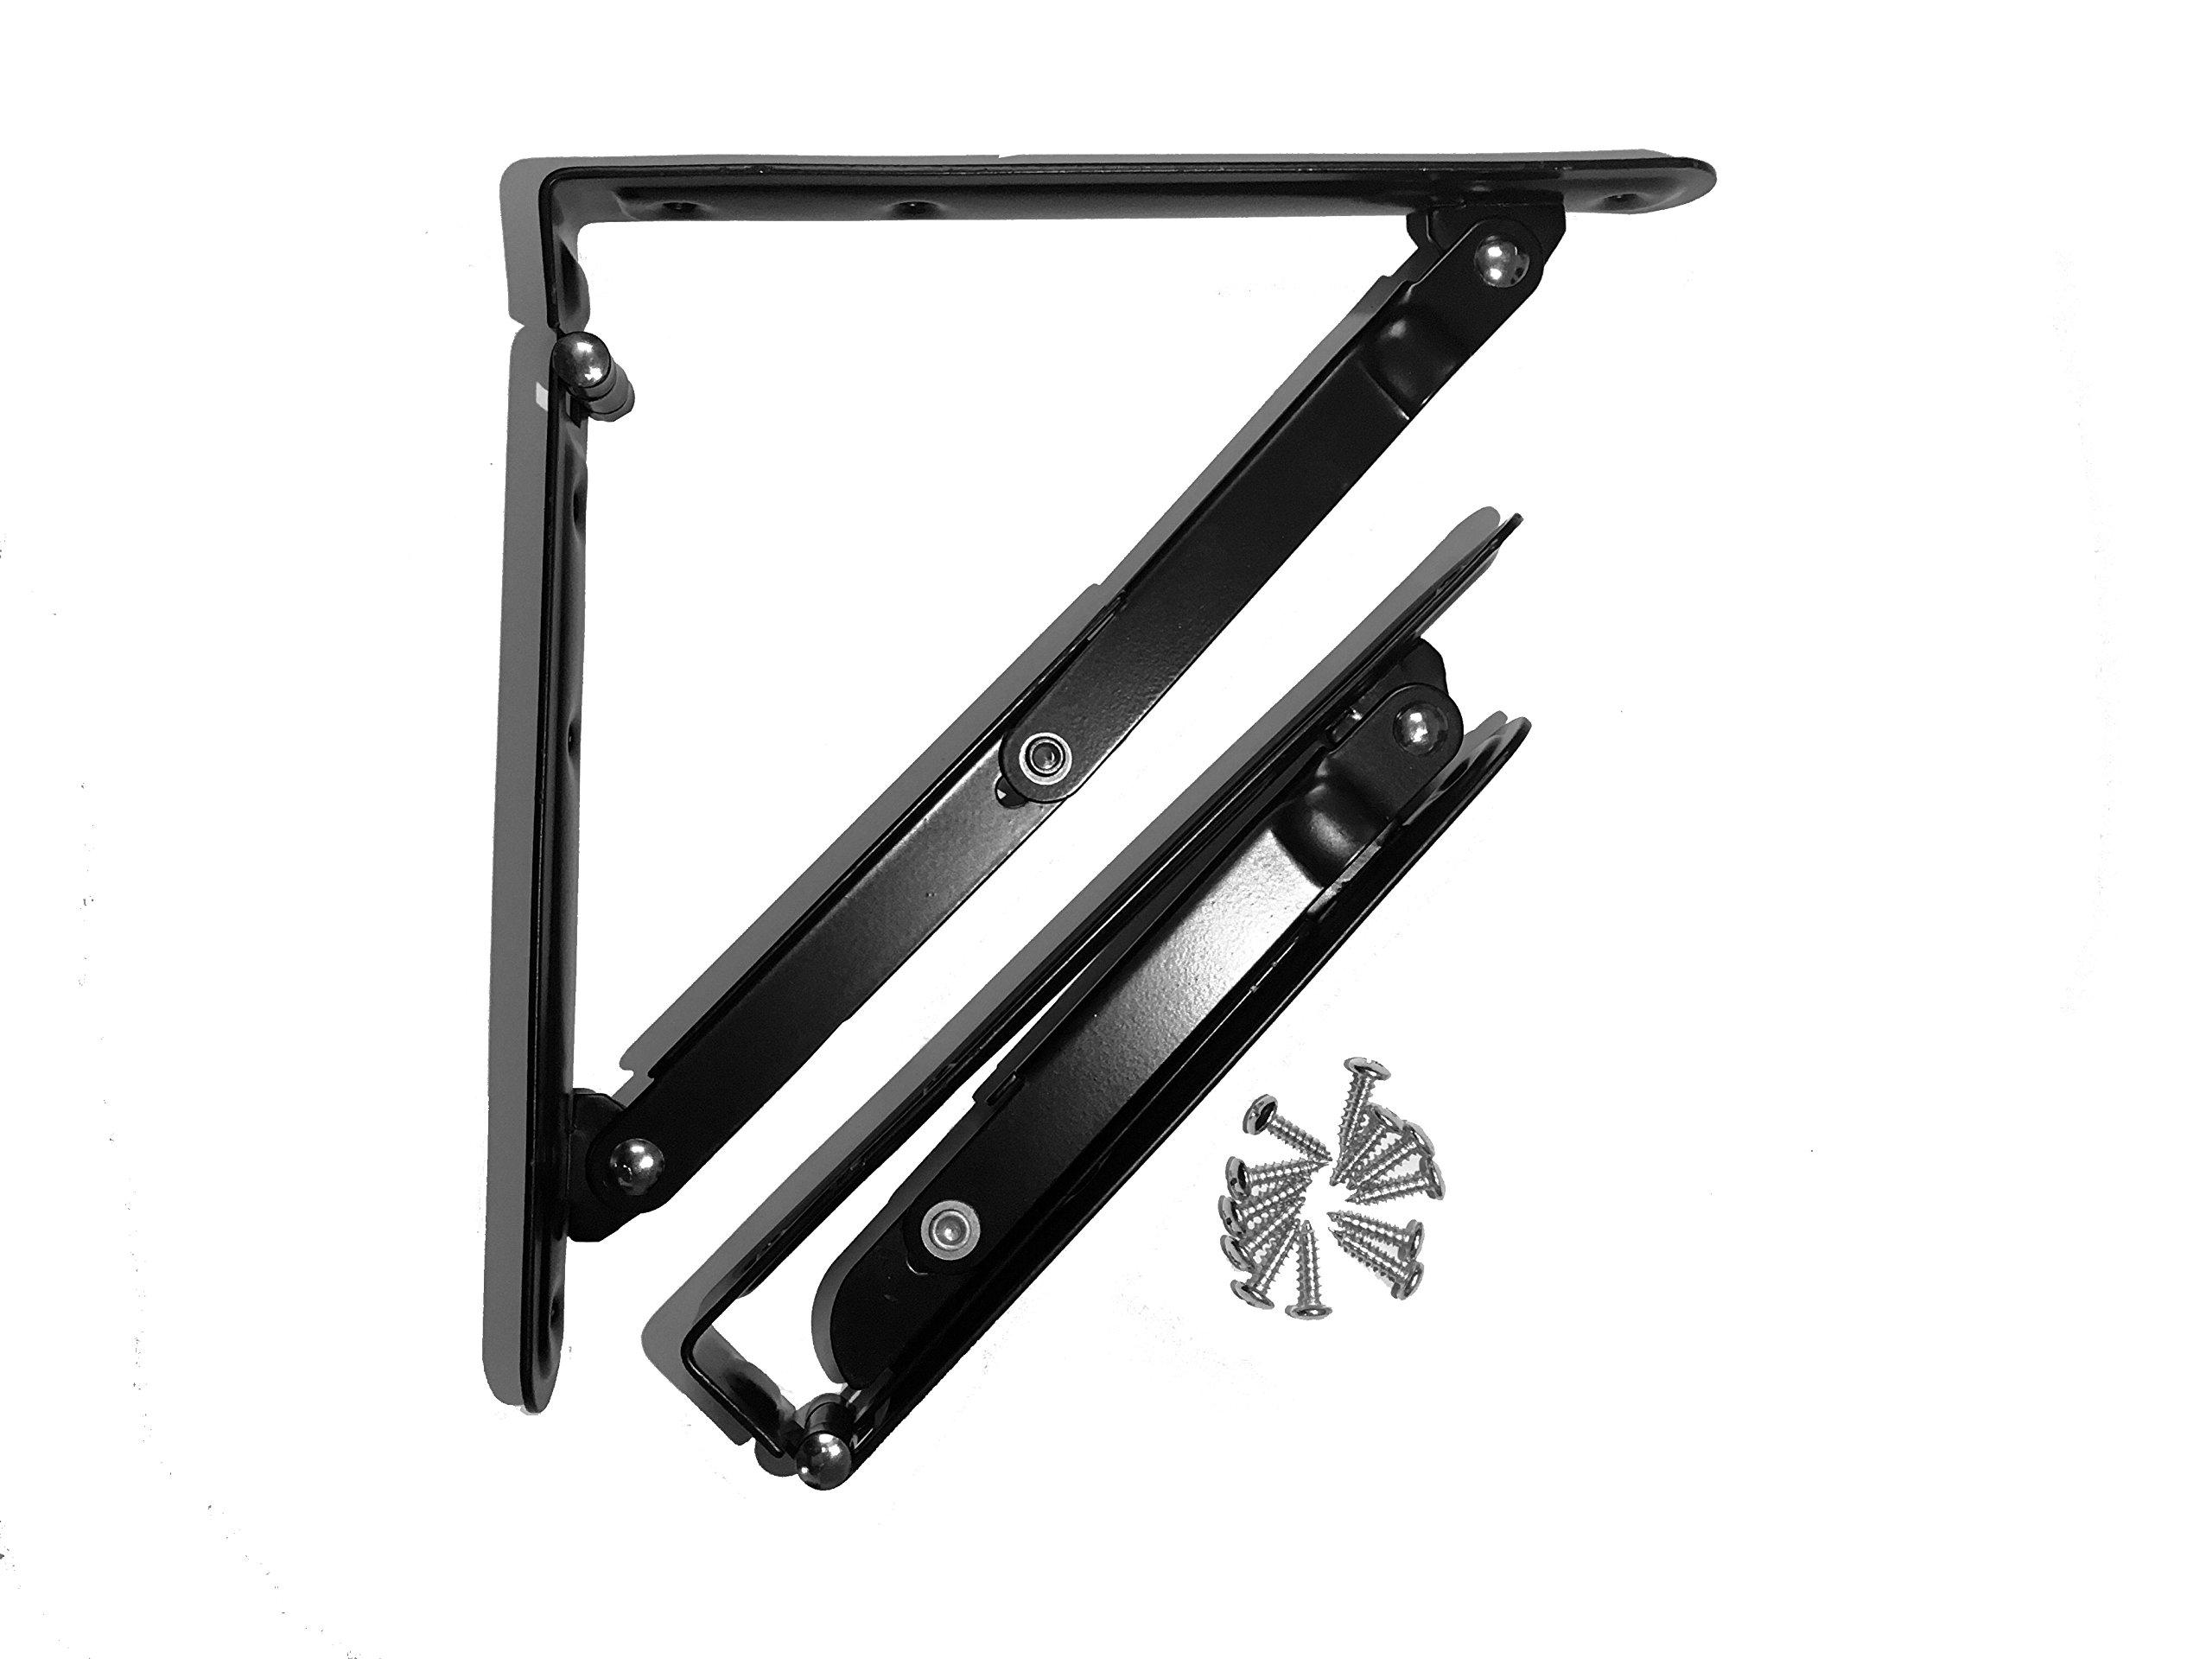 2 Pcs Folding Shelf Bracket Stainless Steel Folding Shelf Bench Table Perfect for Wall Hanging Shelves, Black